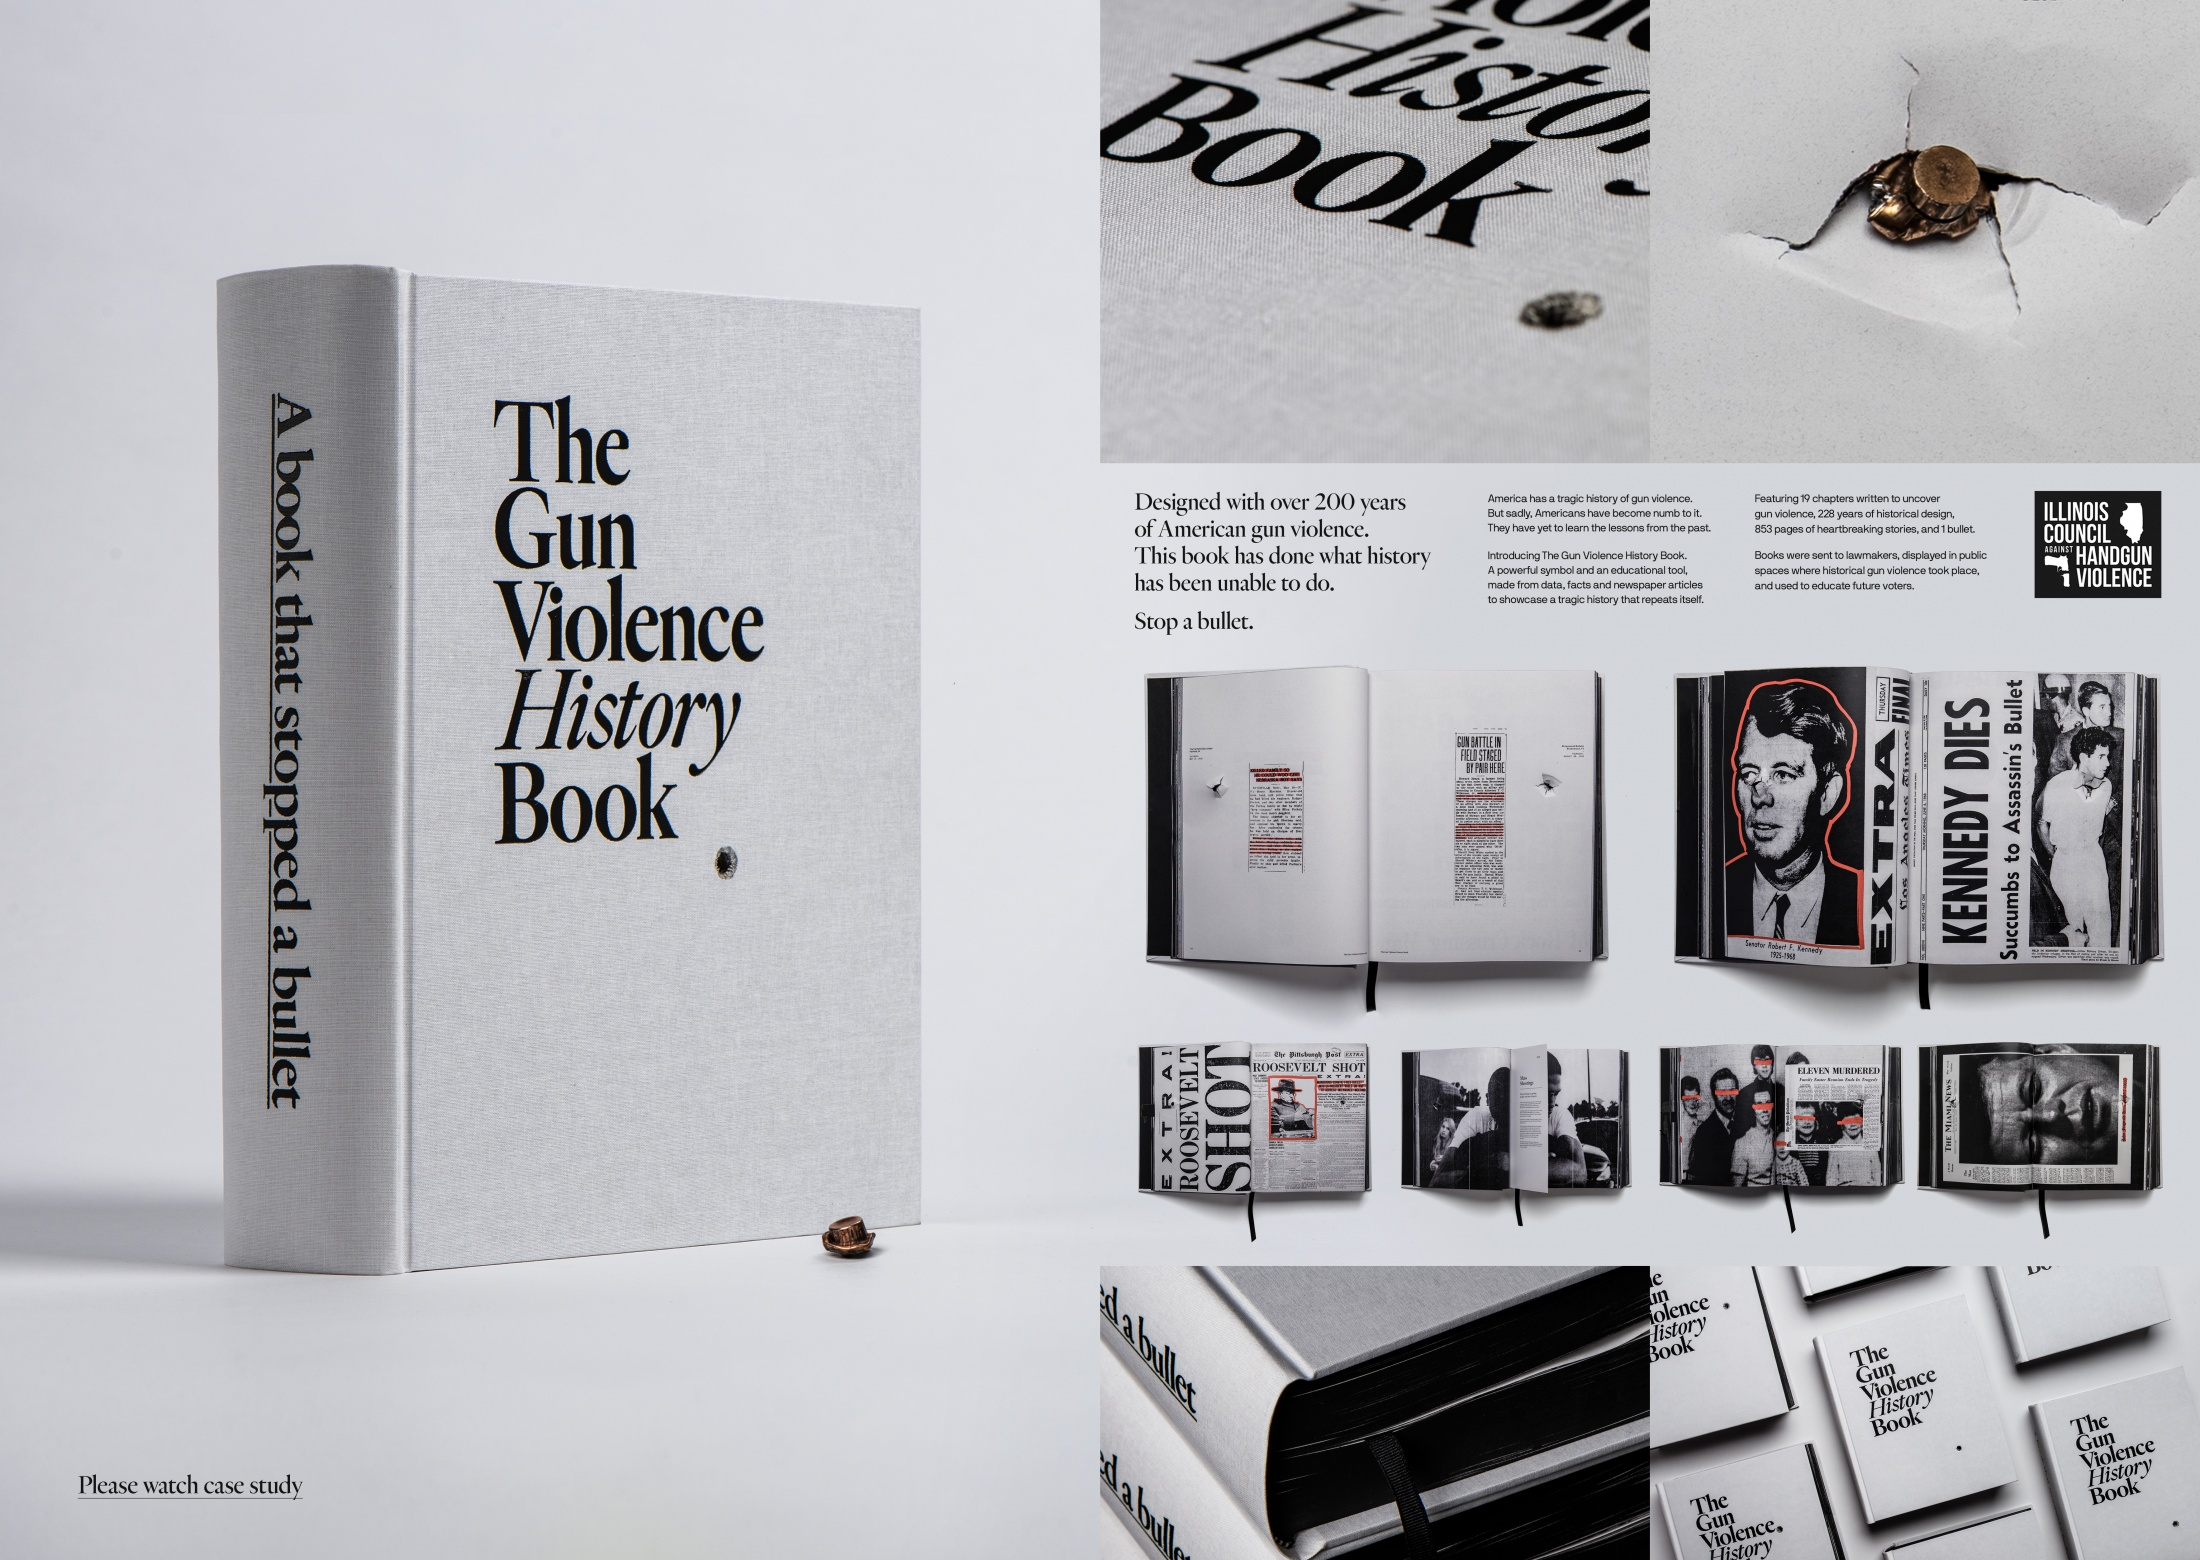 Thumbnail for The Gun Violence History Book